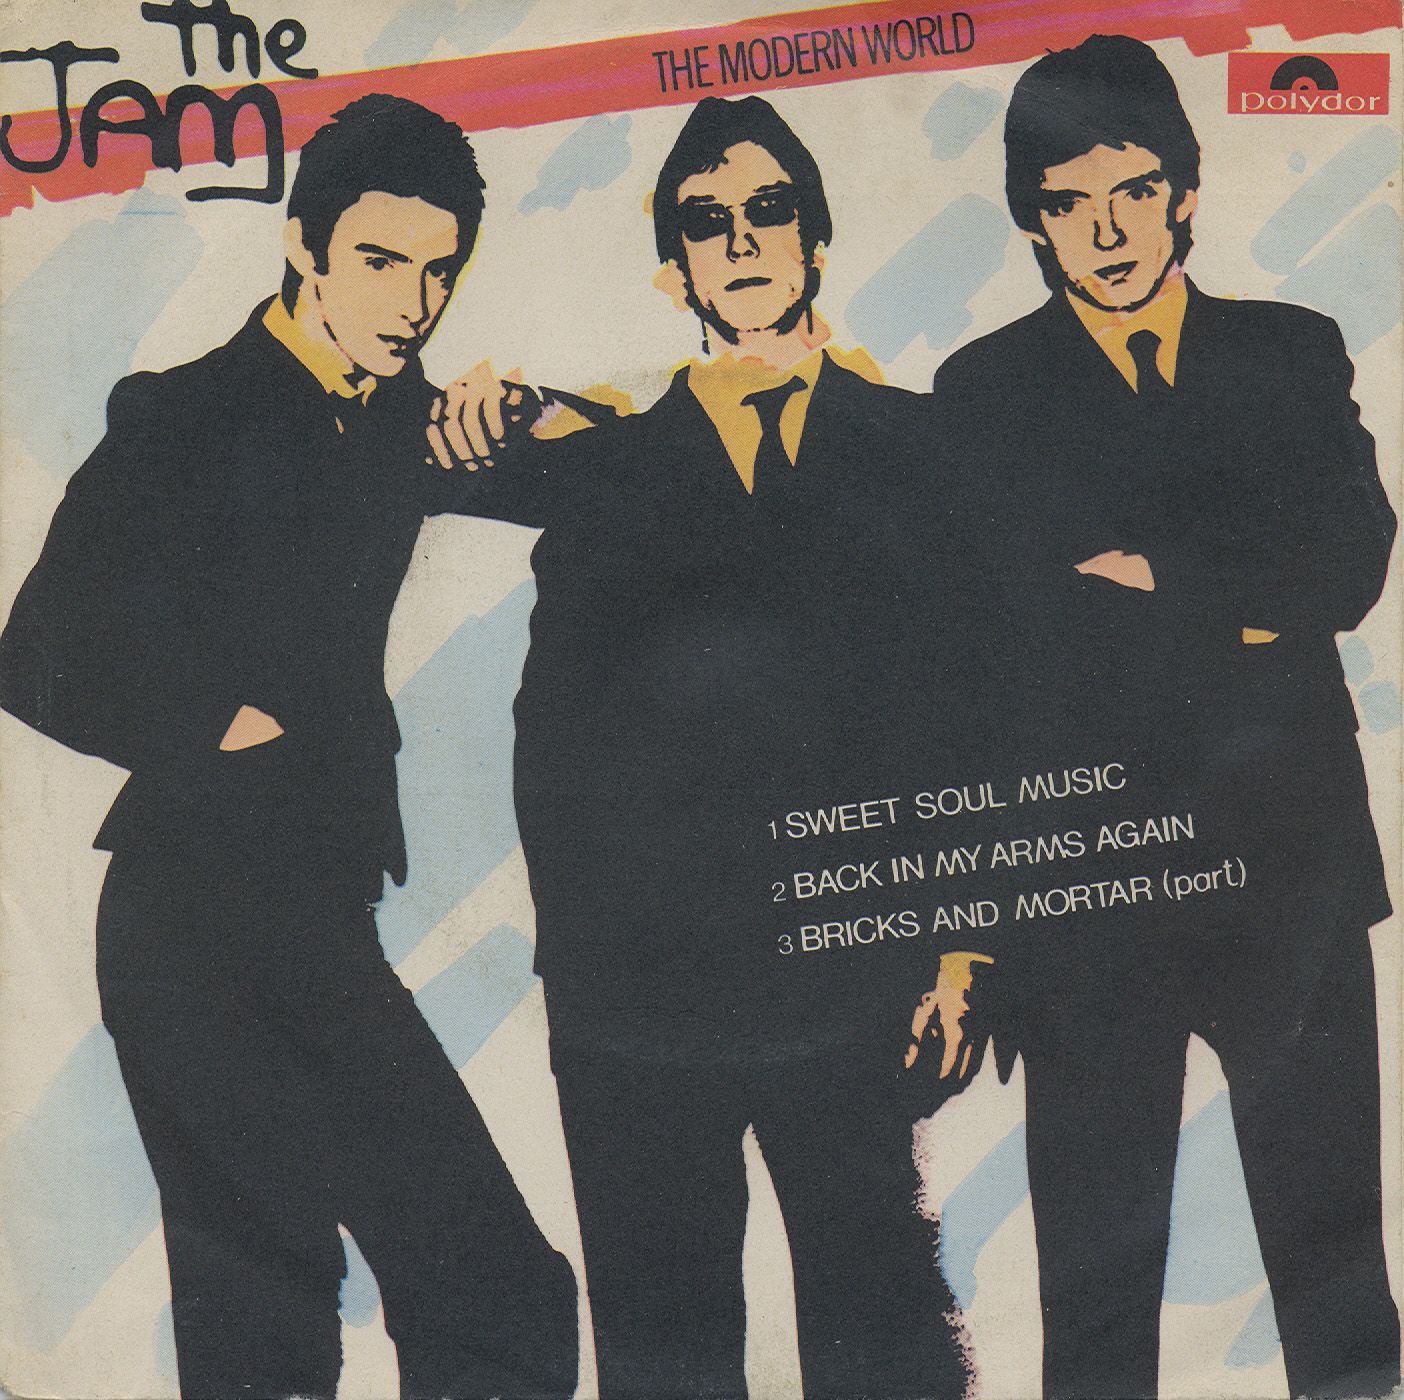 "The Jam - The Modern World [1977, Polydor 2058945│Italy] - 7""/45 vinyl record"